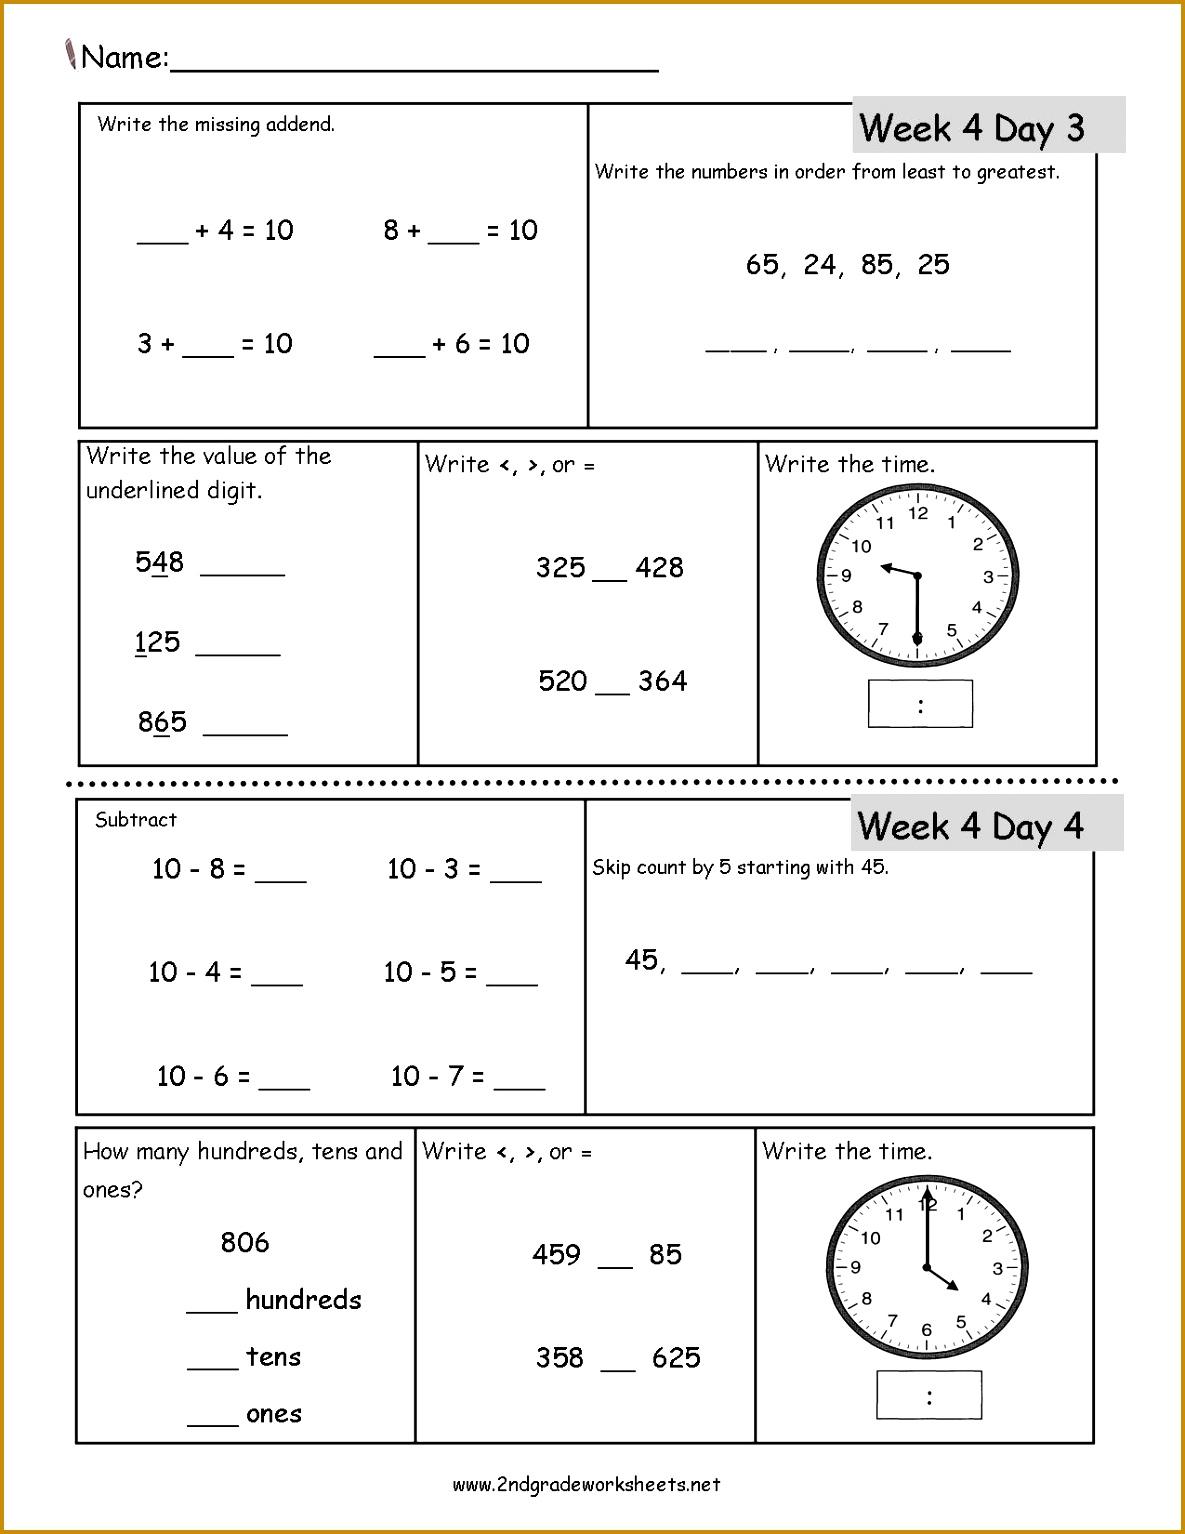 5 Math Worksheets For 2nd Grade